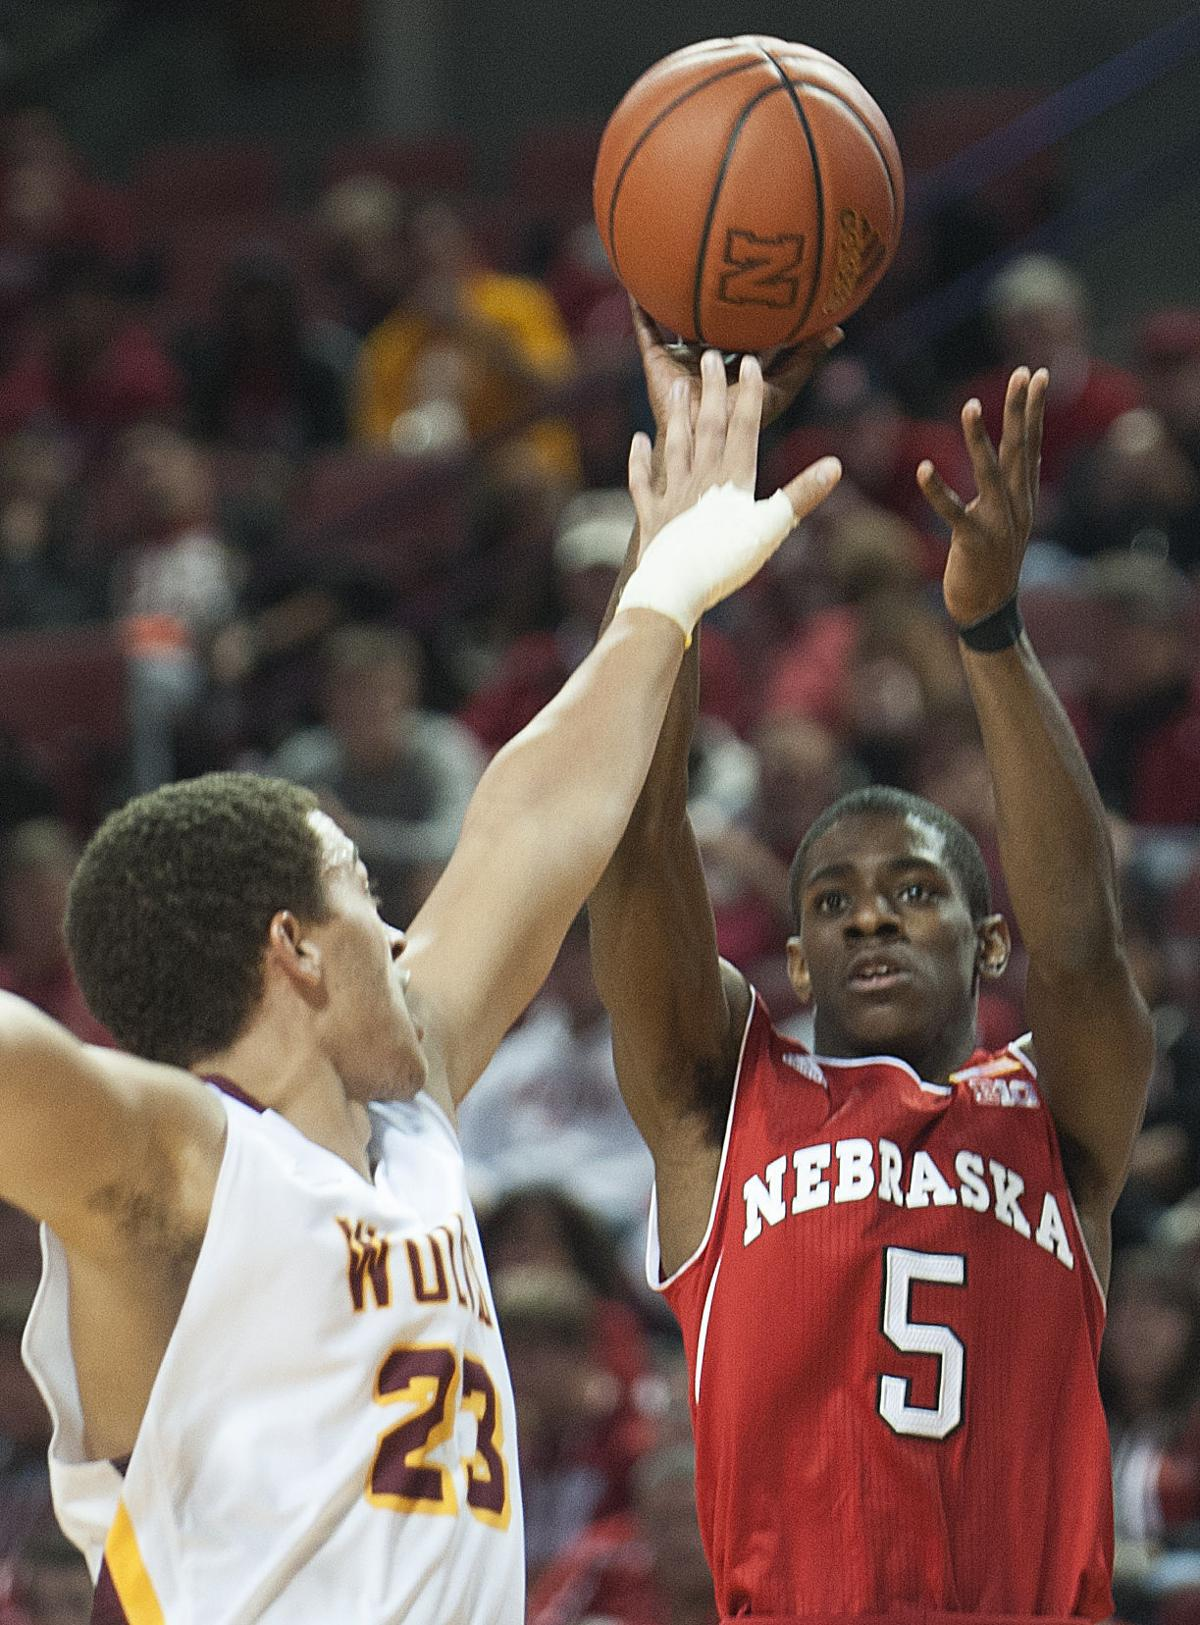 Nebraska Mens Basketball versus Northern State, 11.09.15 (Exhibition)